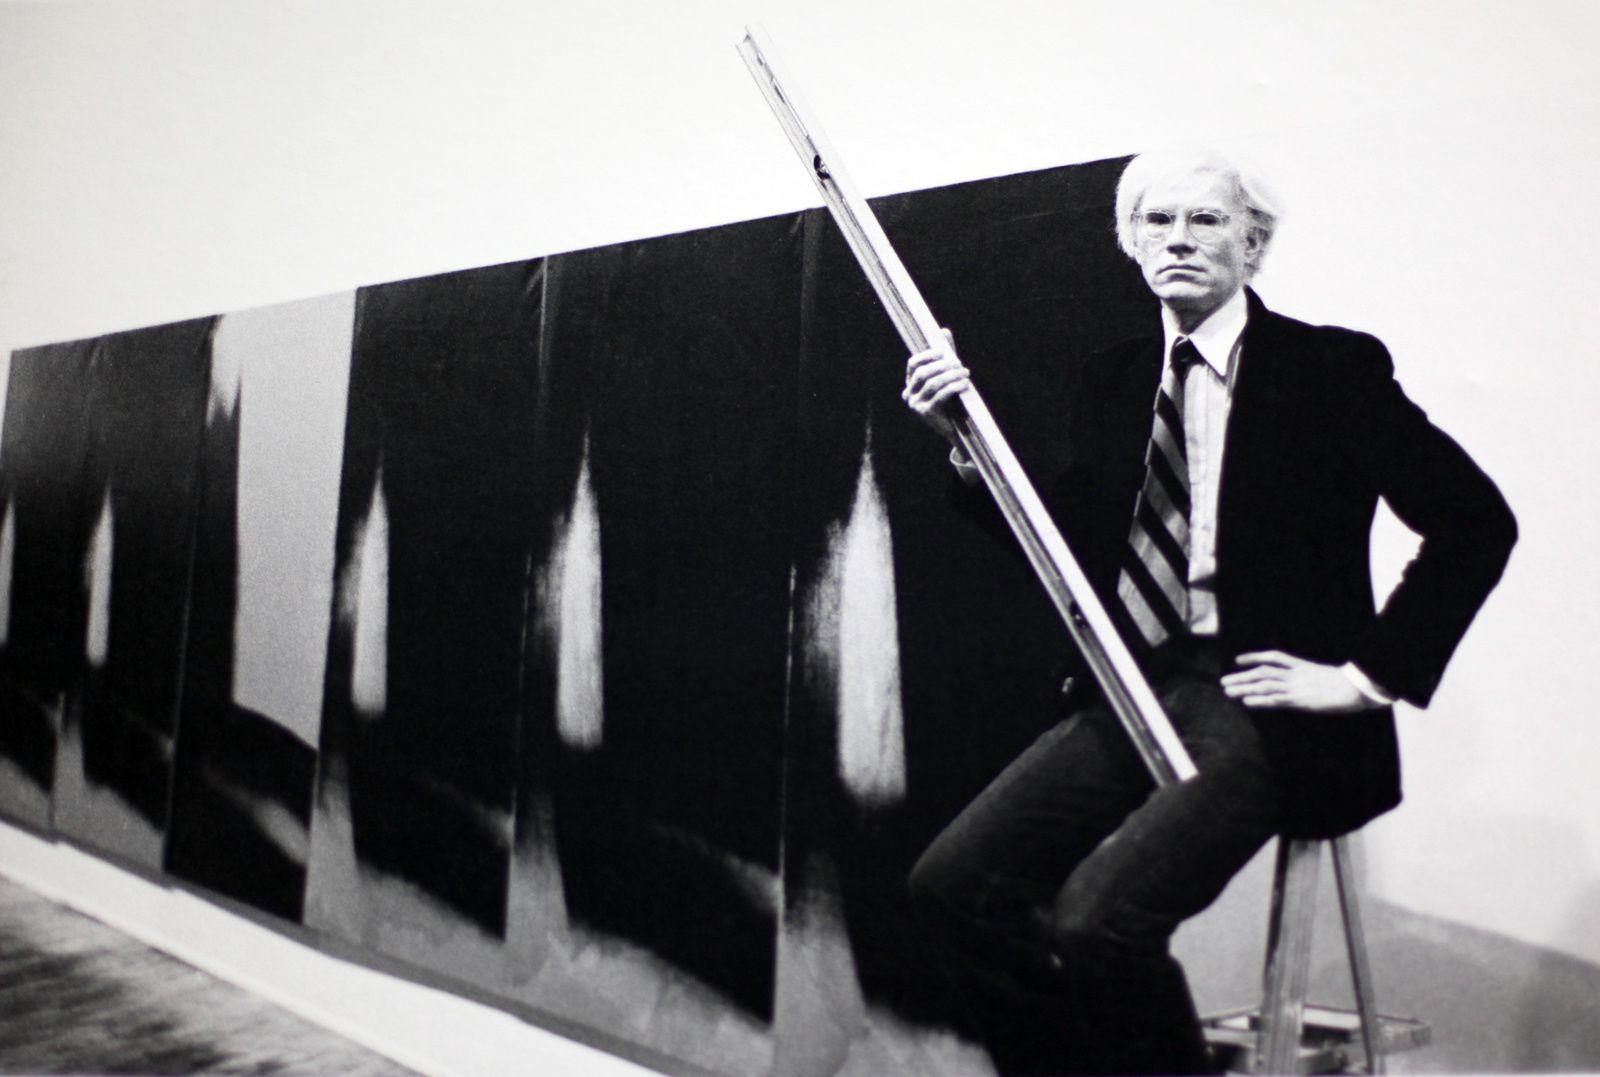 Warhol devant les Shadows à la Heiner Friedrich Gallery, NY janvier 1979